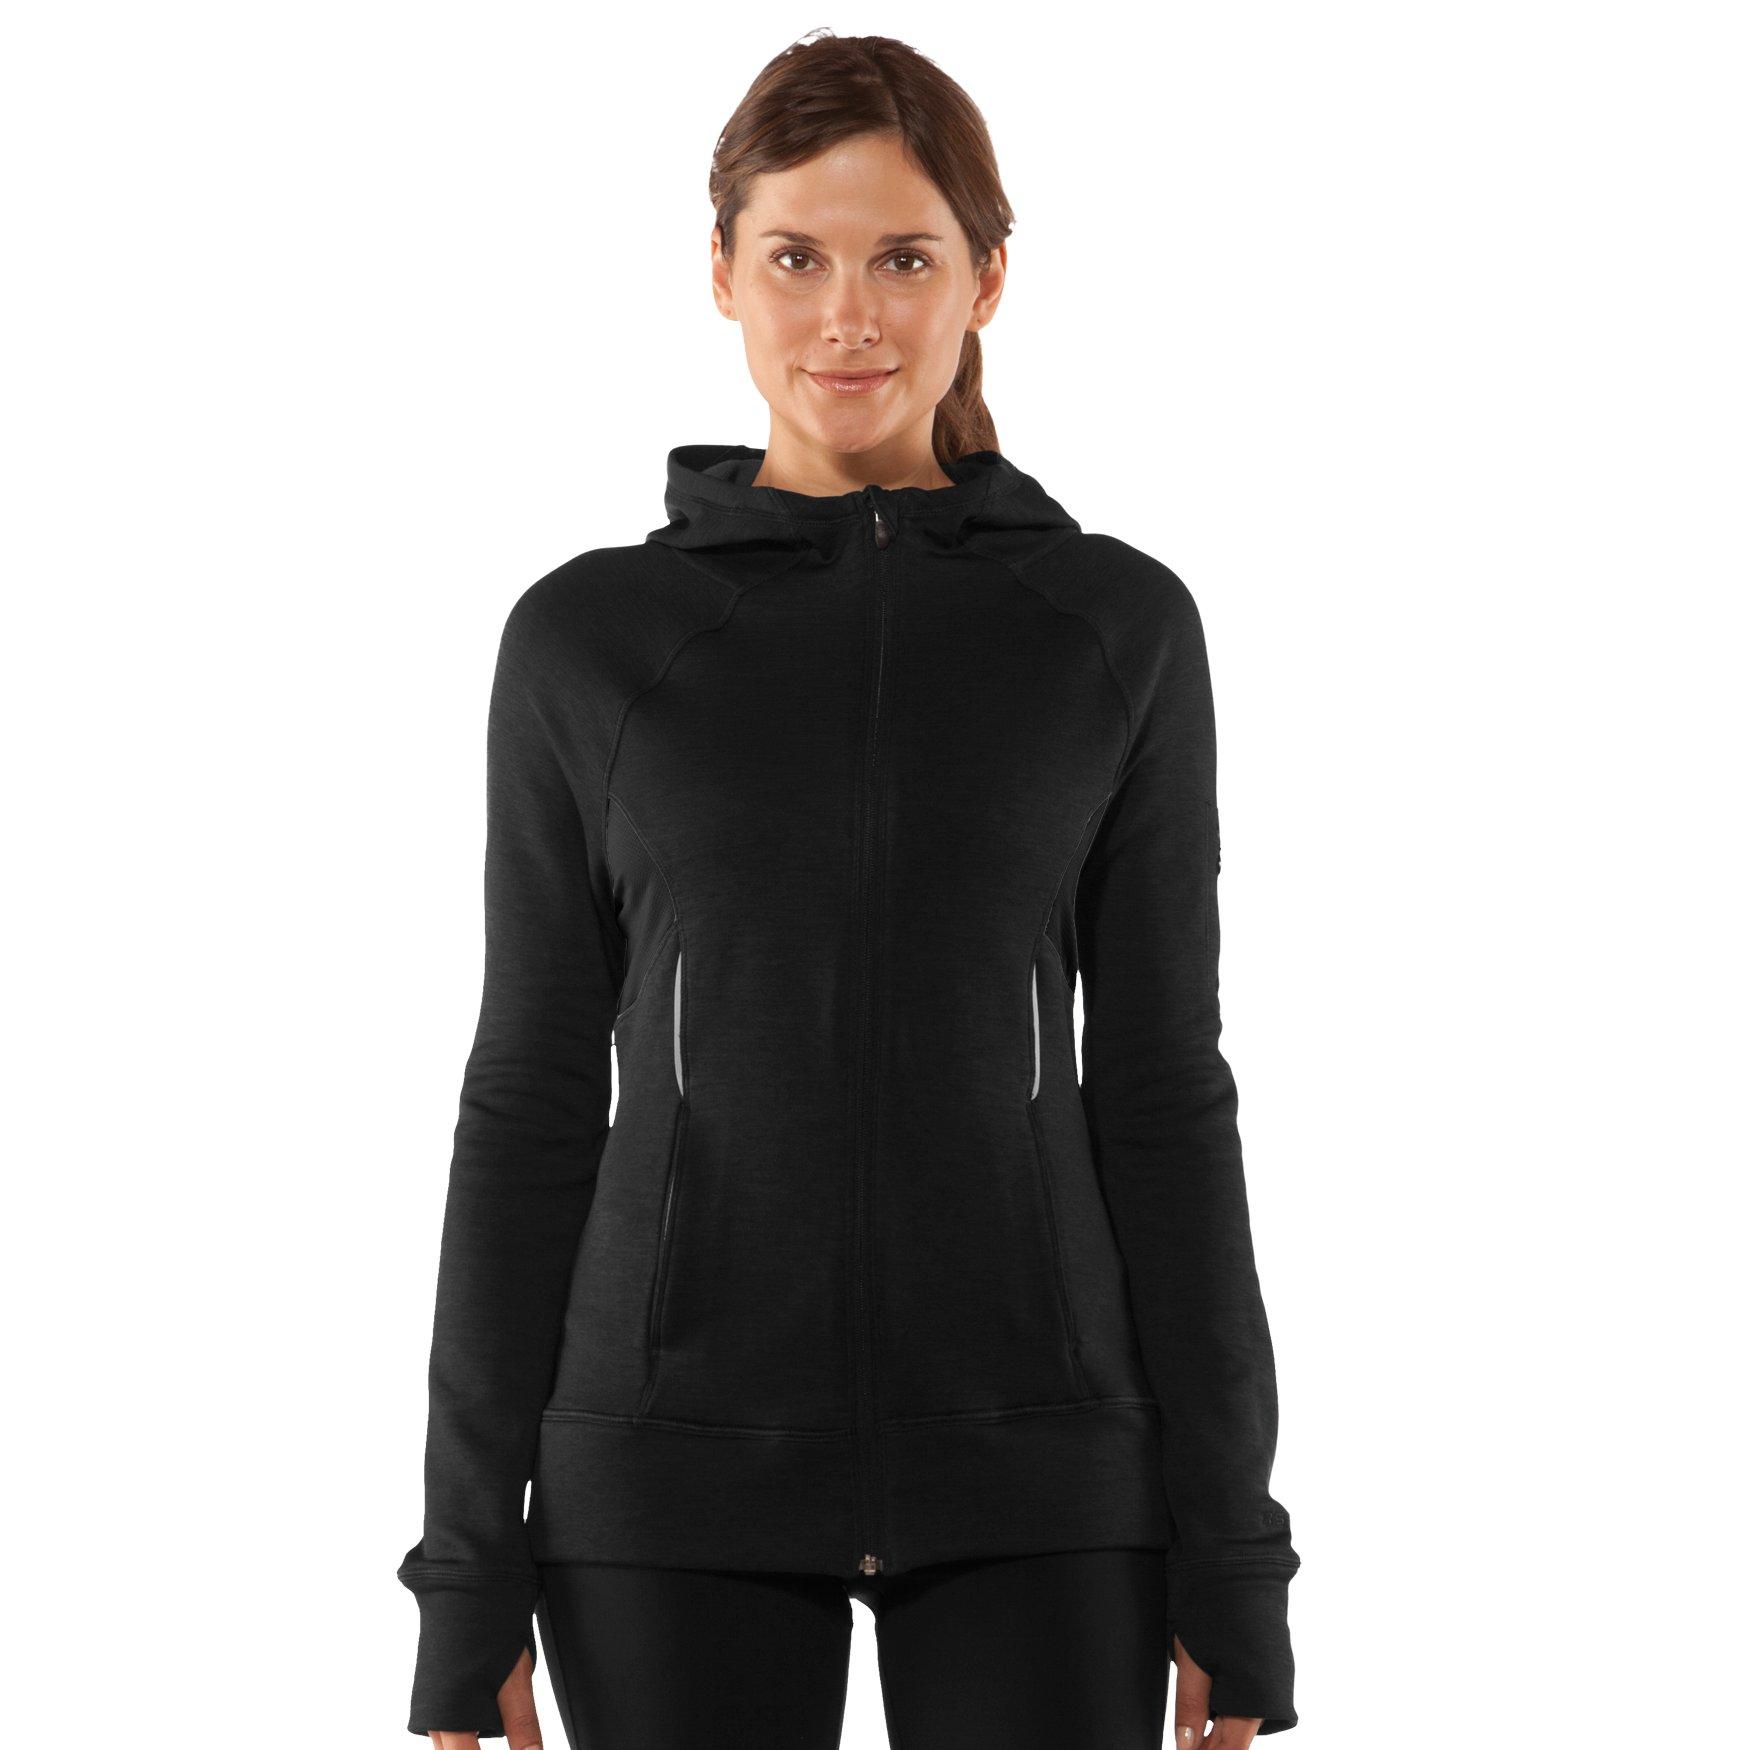 62292980d Sue Asks About Women's UA Storm Fleece Full Zip - Needle